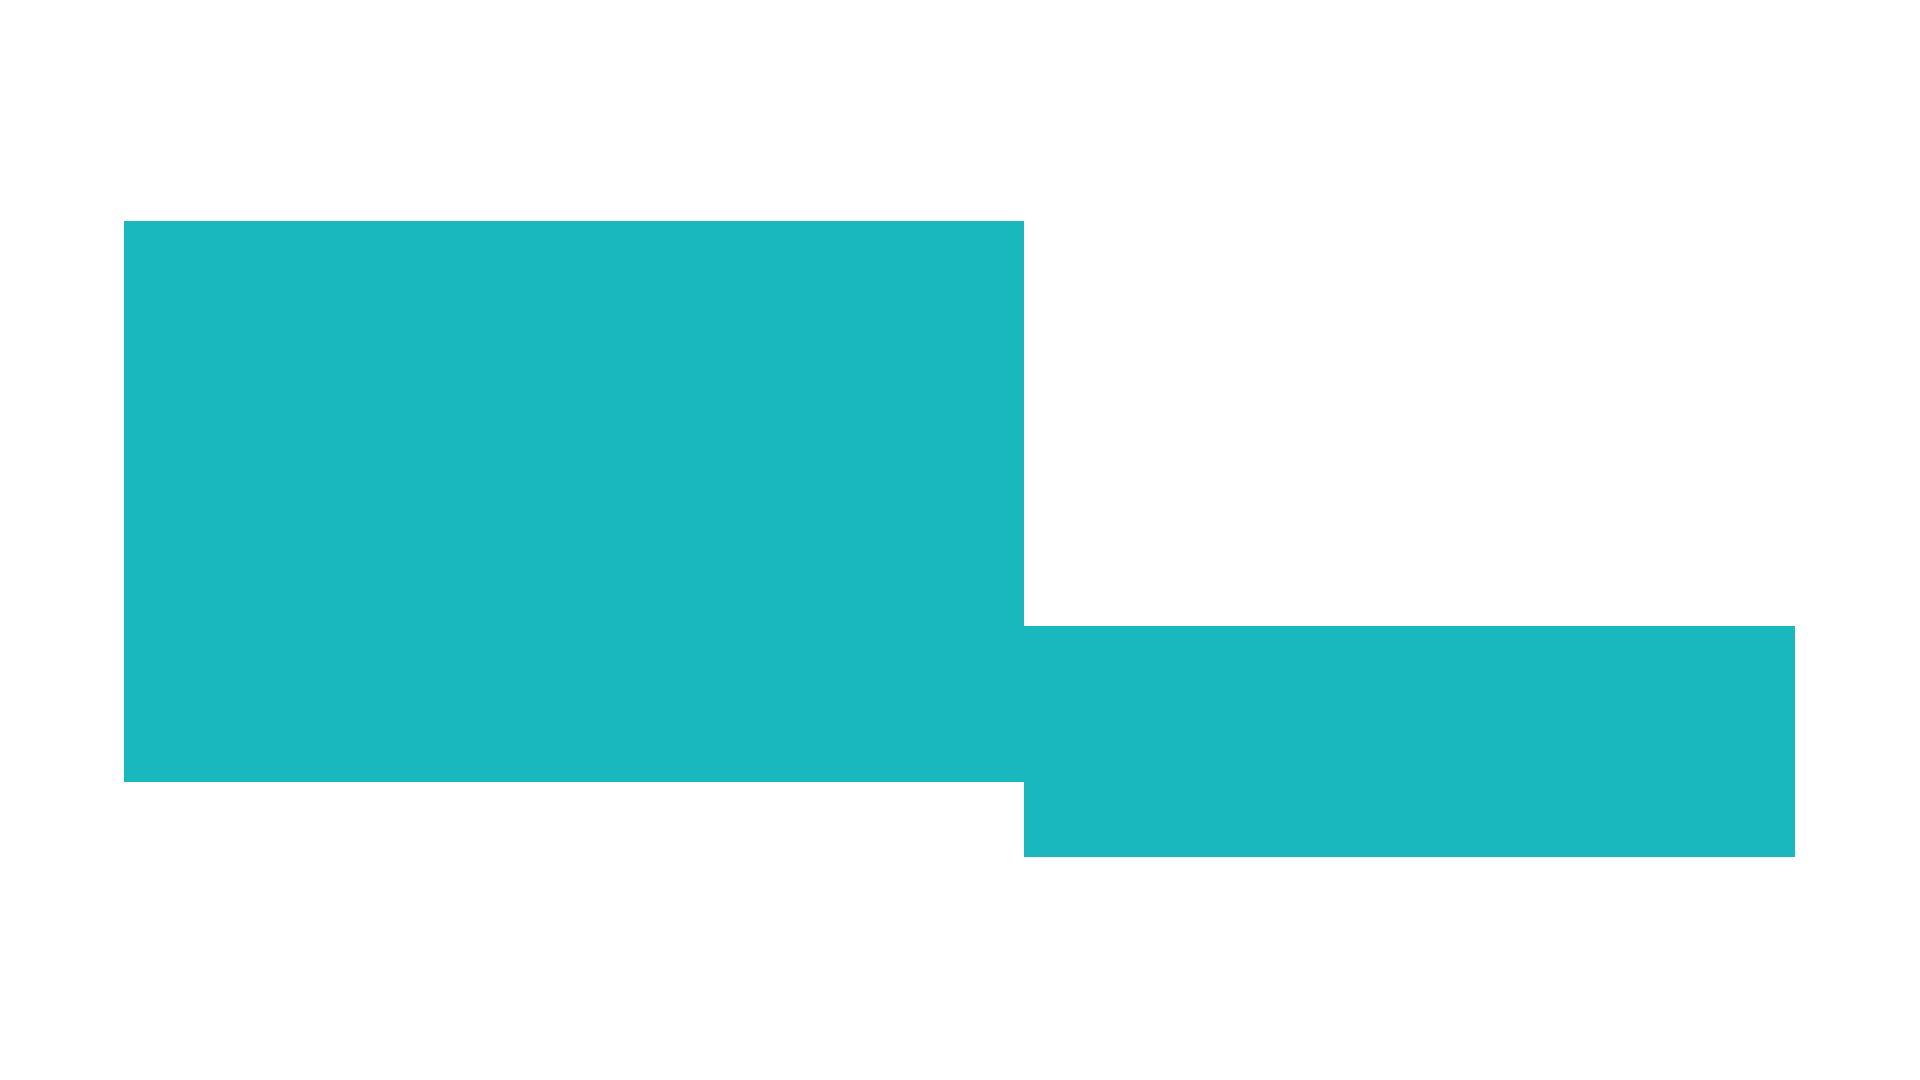 Machineboy